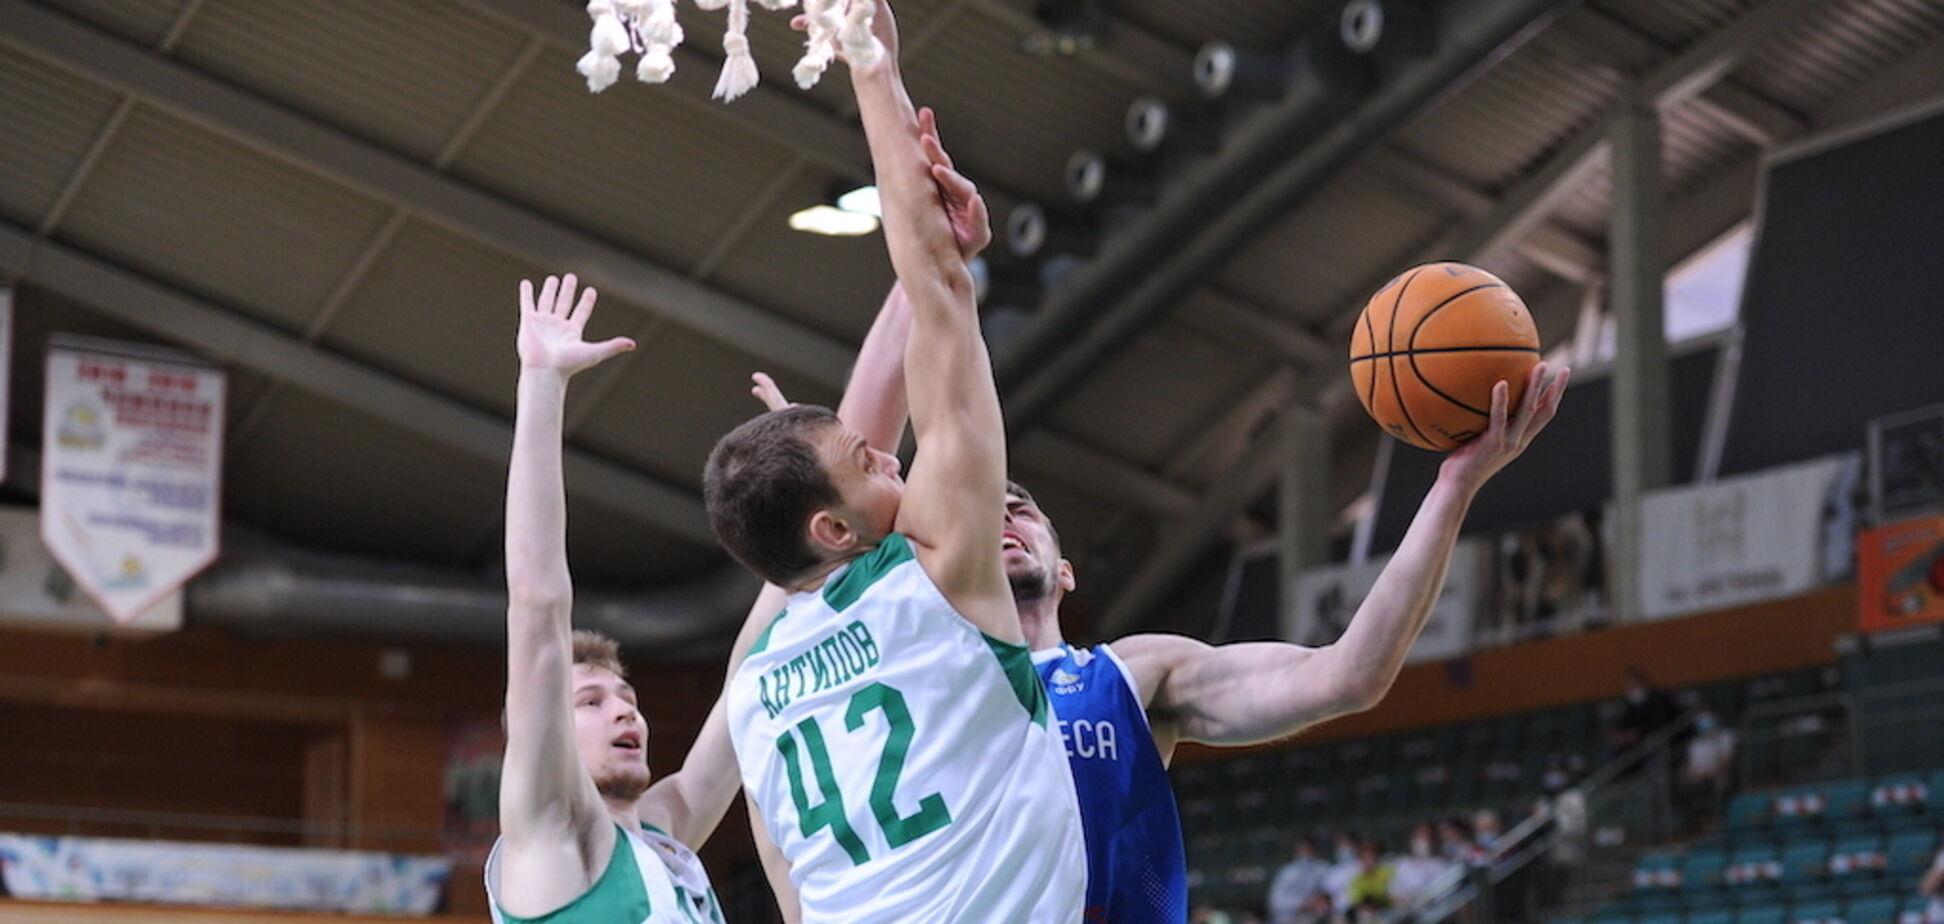 'Химик' выиграл дерби, победа 'Киев-Баскета': результаты Суперлиги Windrose 24 сентября